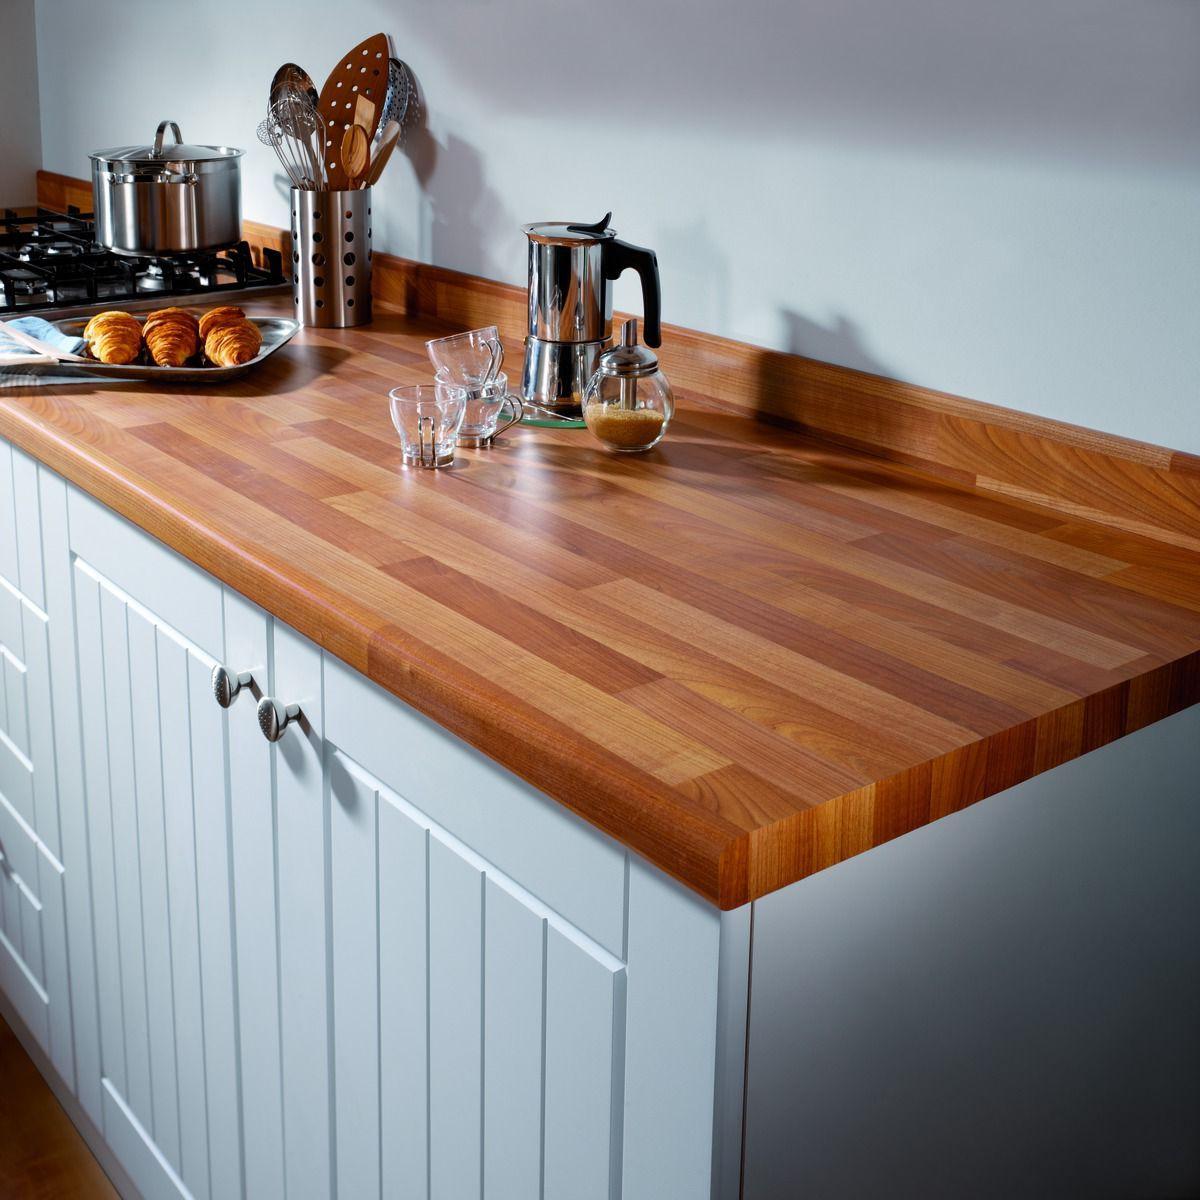 Kitchen Worktops That Fit Over Existing Worktops: Cherry Block Effect 600mm X 38mm